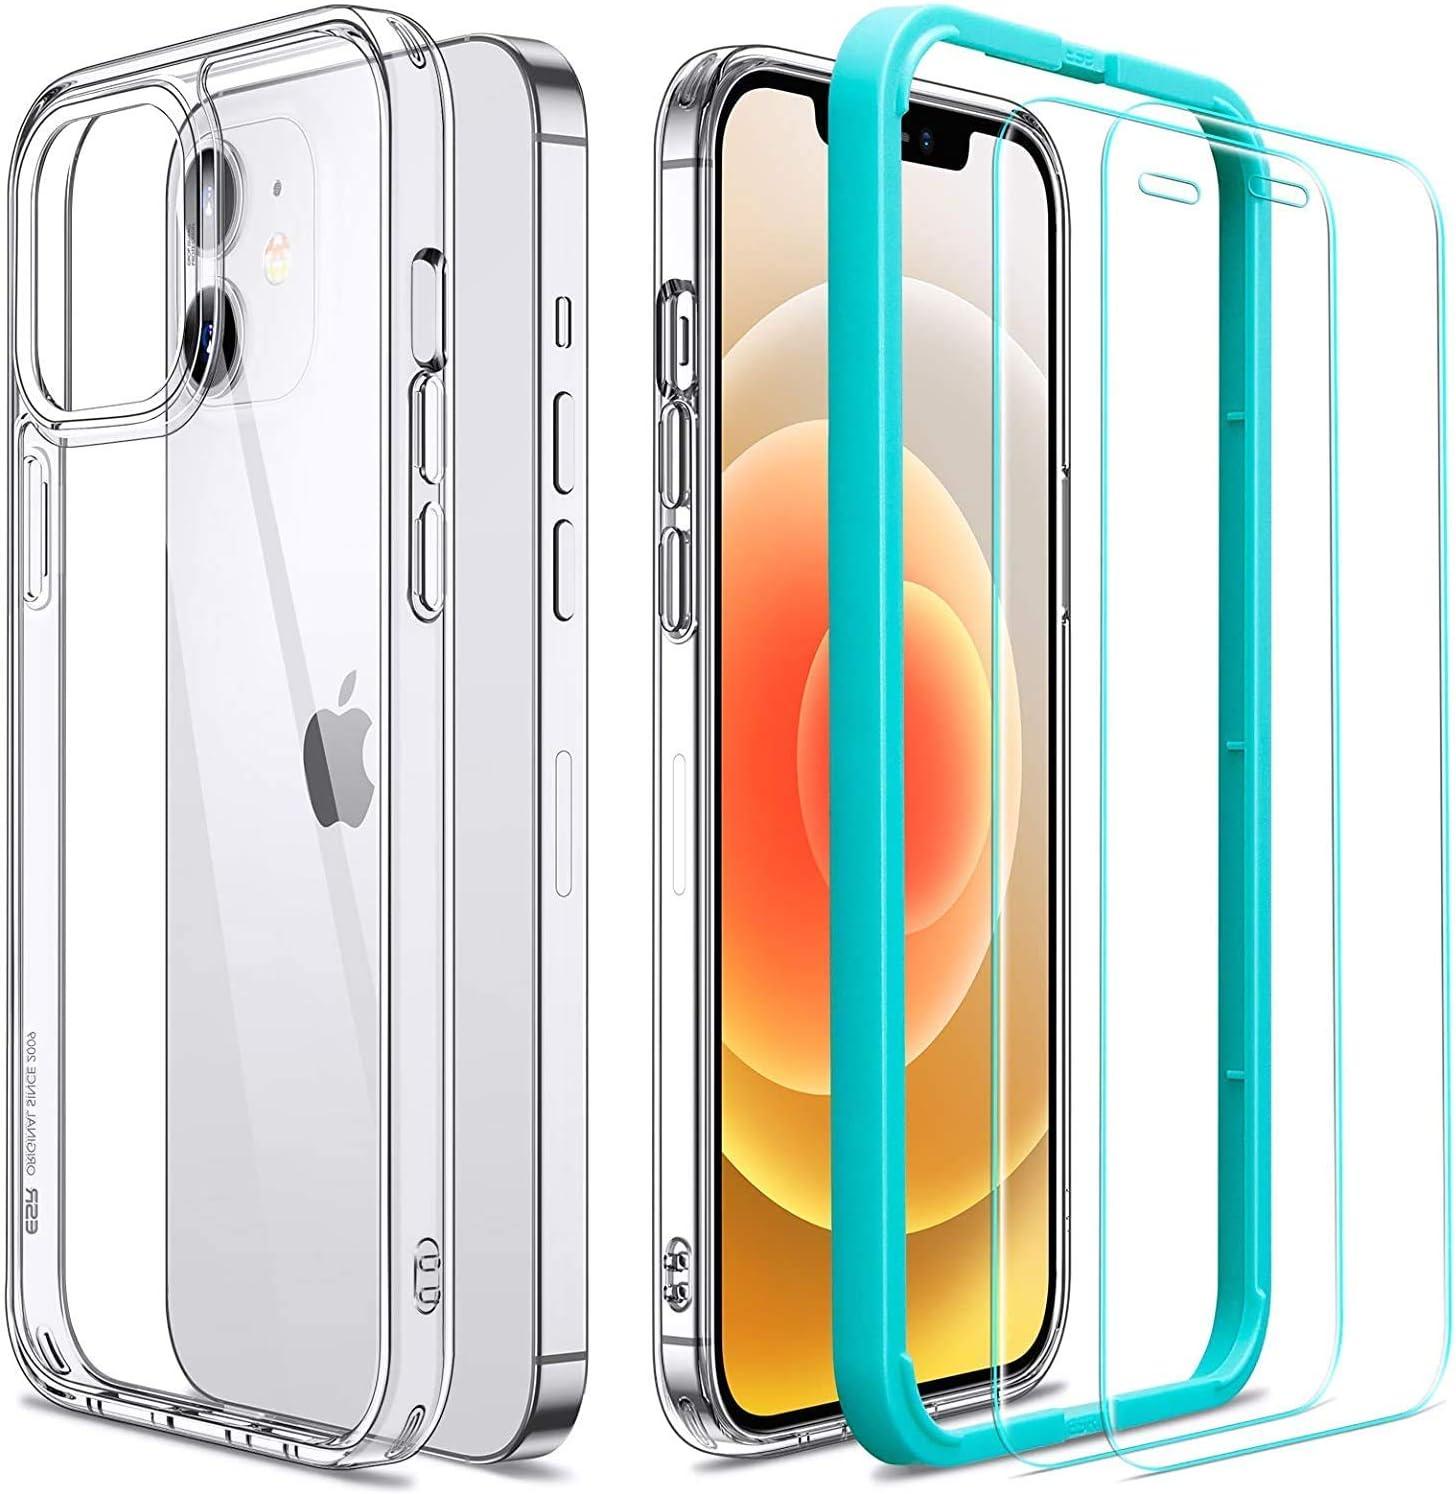 "ESR Funda Transparente para iPhone 12/iPhone 12 Pro + 2 Protector de Pantalla [Tapa Trasera 1,1mm Grosor] [Cristal Templado] [Esquinas con Cámaras de Aire] Funda Ultrafina para iPhone 12/12 Pro 6,1"""